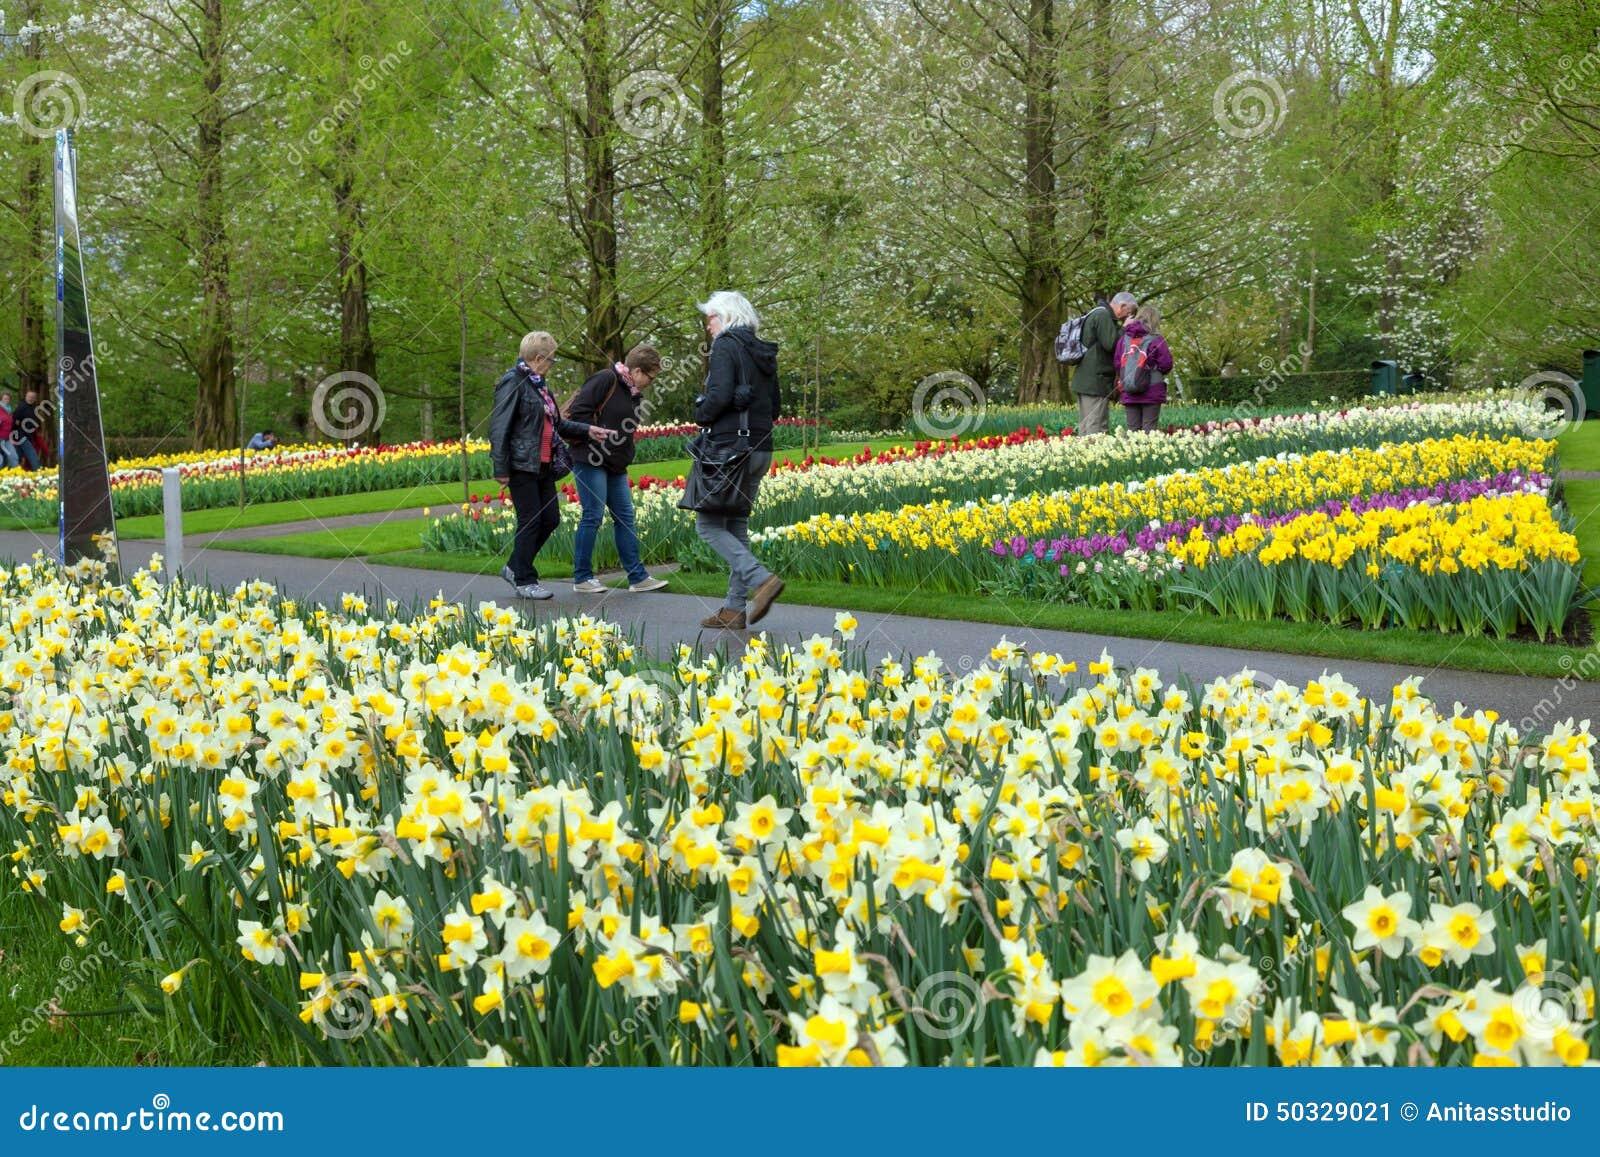 KEUKENHOF ΚΗΠΟΣ, ΚΑΤΩ ΧΏΡΕΣ - 8 ΑΠΡΙΛΊΟΥ: Το Keukenhof είναι ο κήπος παγκόσμιων μεγαλύτερος λουλουδιών με 7 εκατομμύριο βολβούς λ